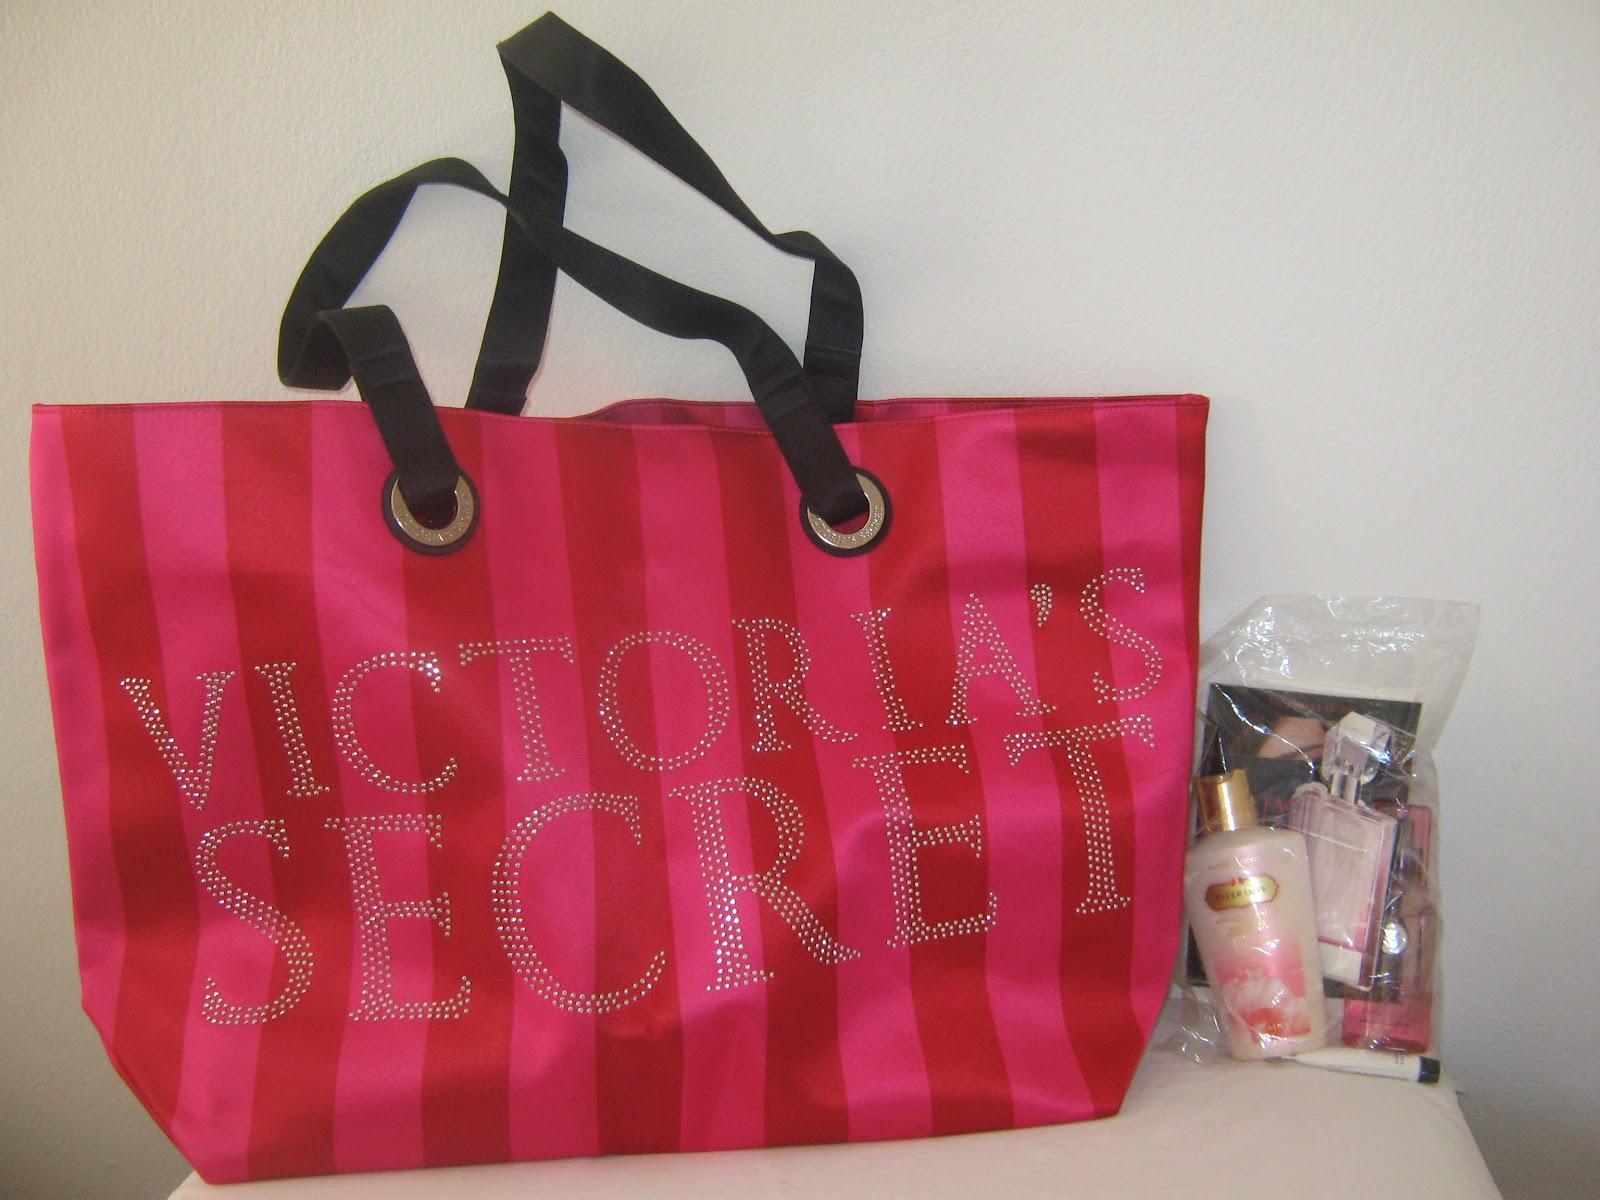 Bolsa Dourada Victoria Secrets : Petit gateau cosm?ticos